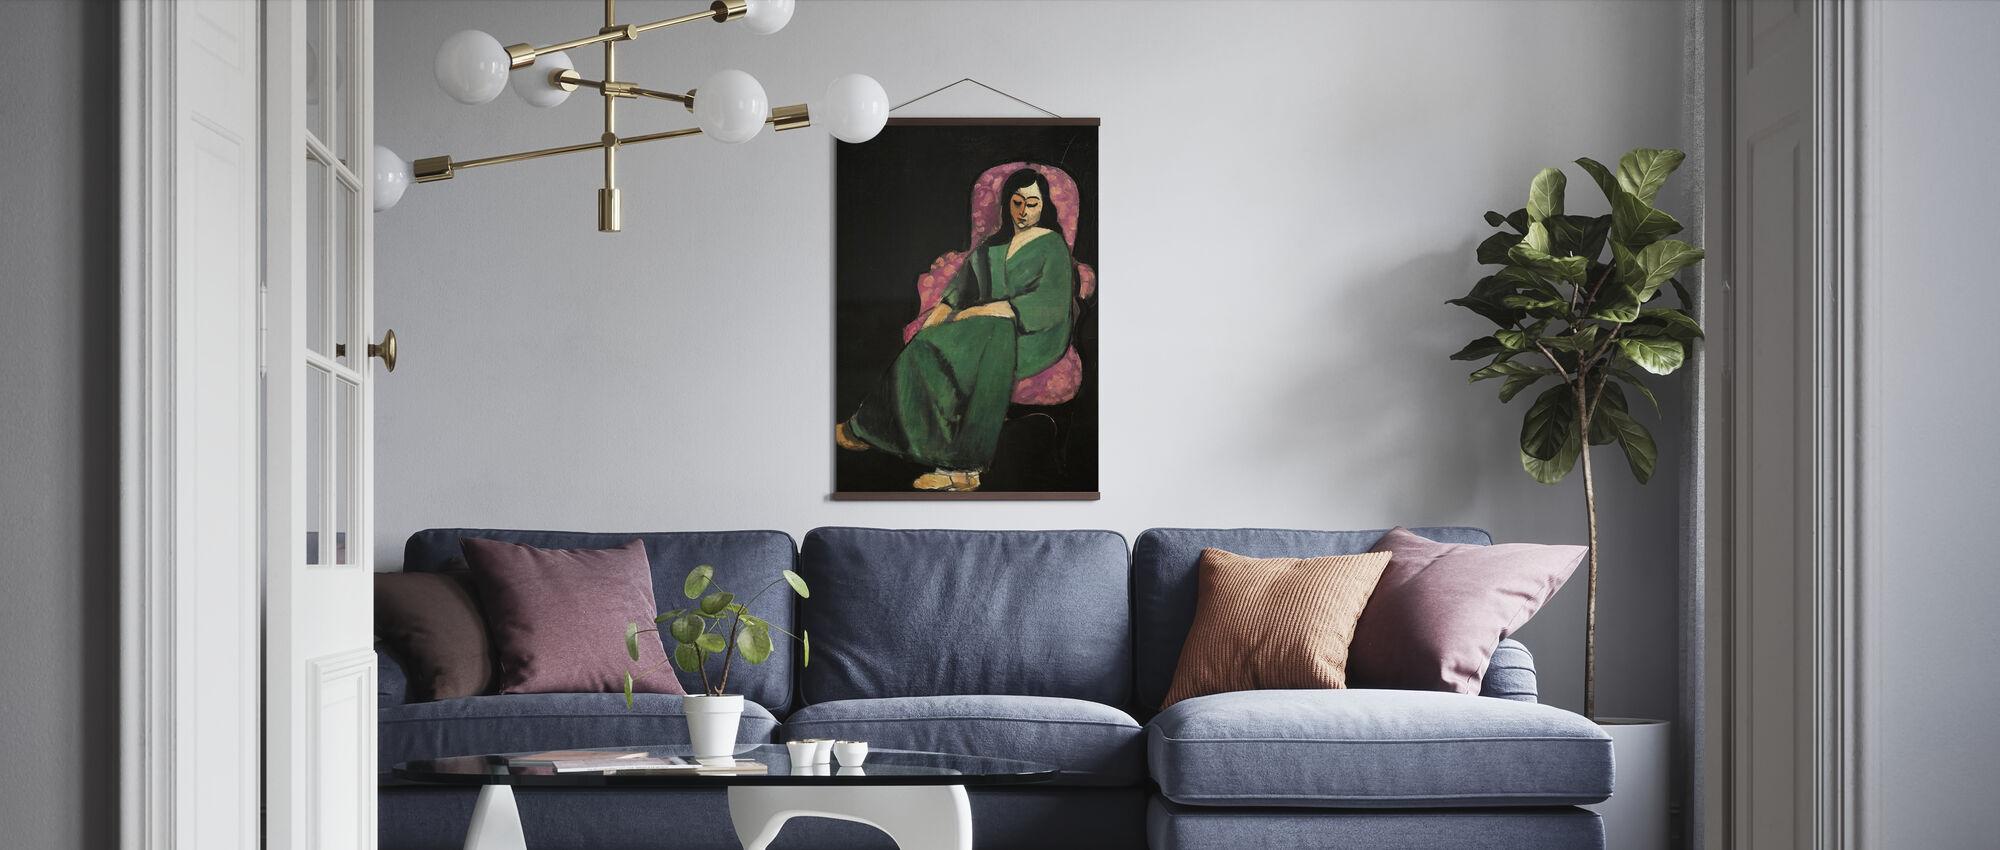 Handmaids Tale - Henri Matisse - Poster - Living Room